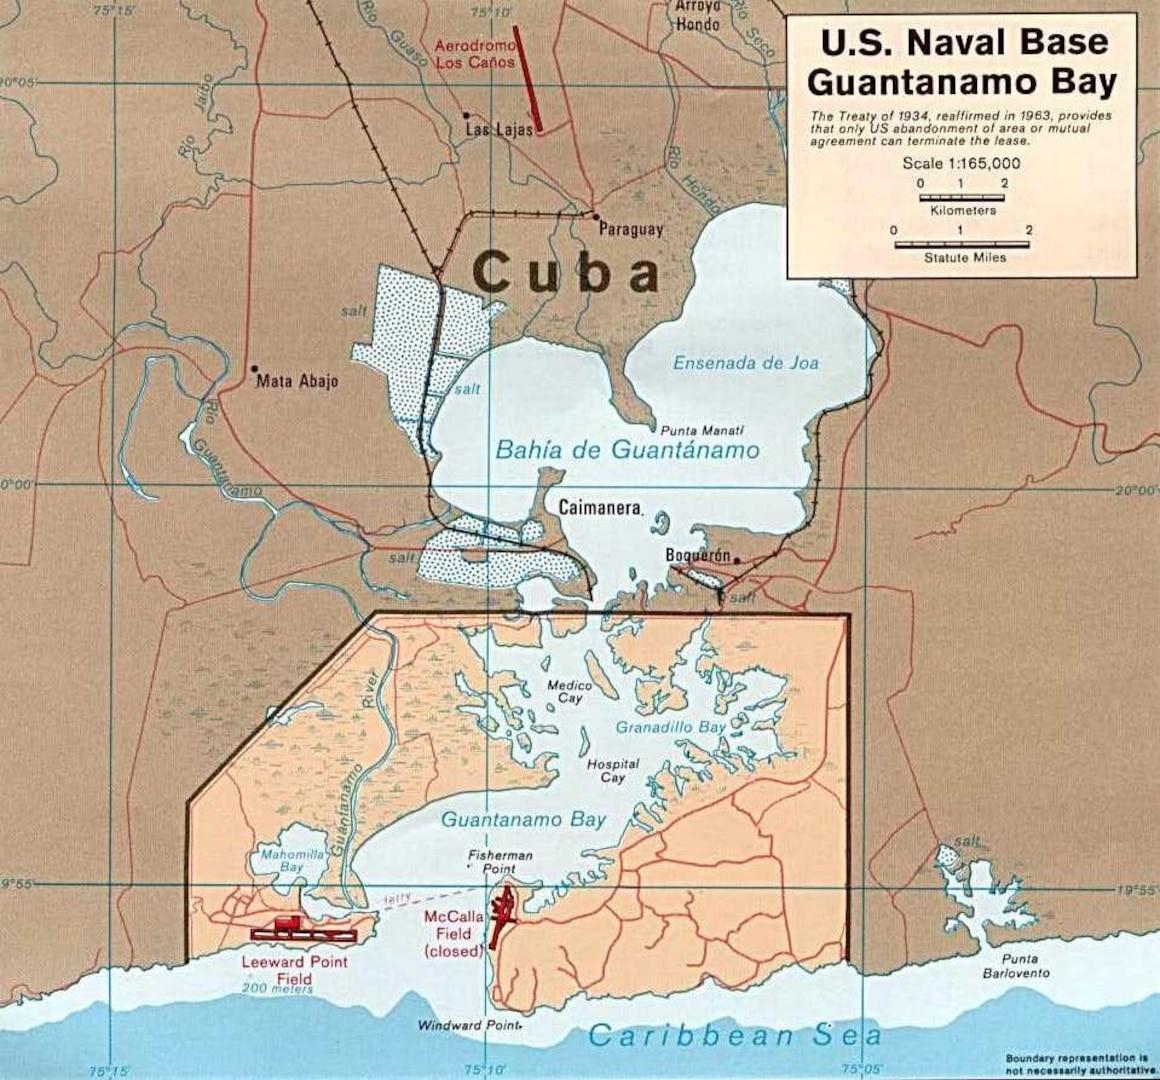 Old chart showing Guantanamo Naval Base and location of Guantanamo Light on Windward Point. (Wikipedia)